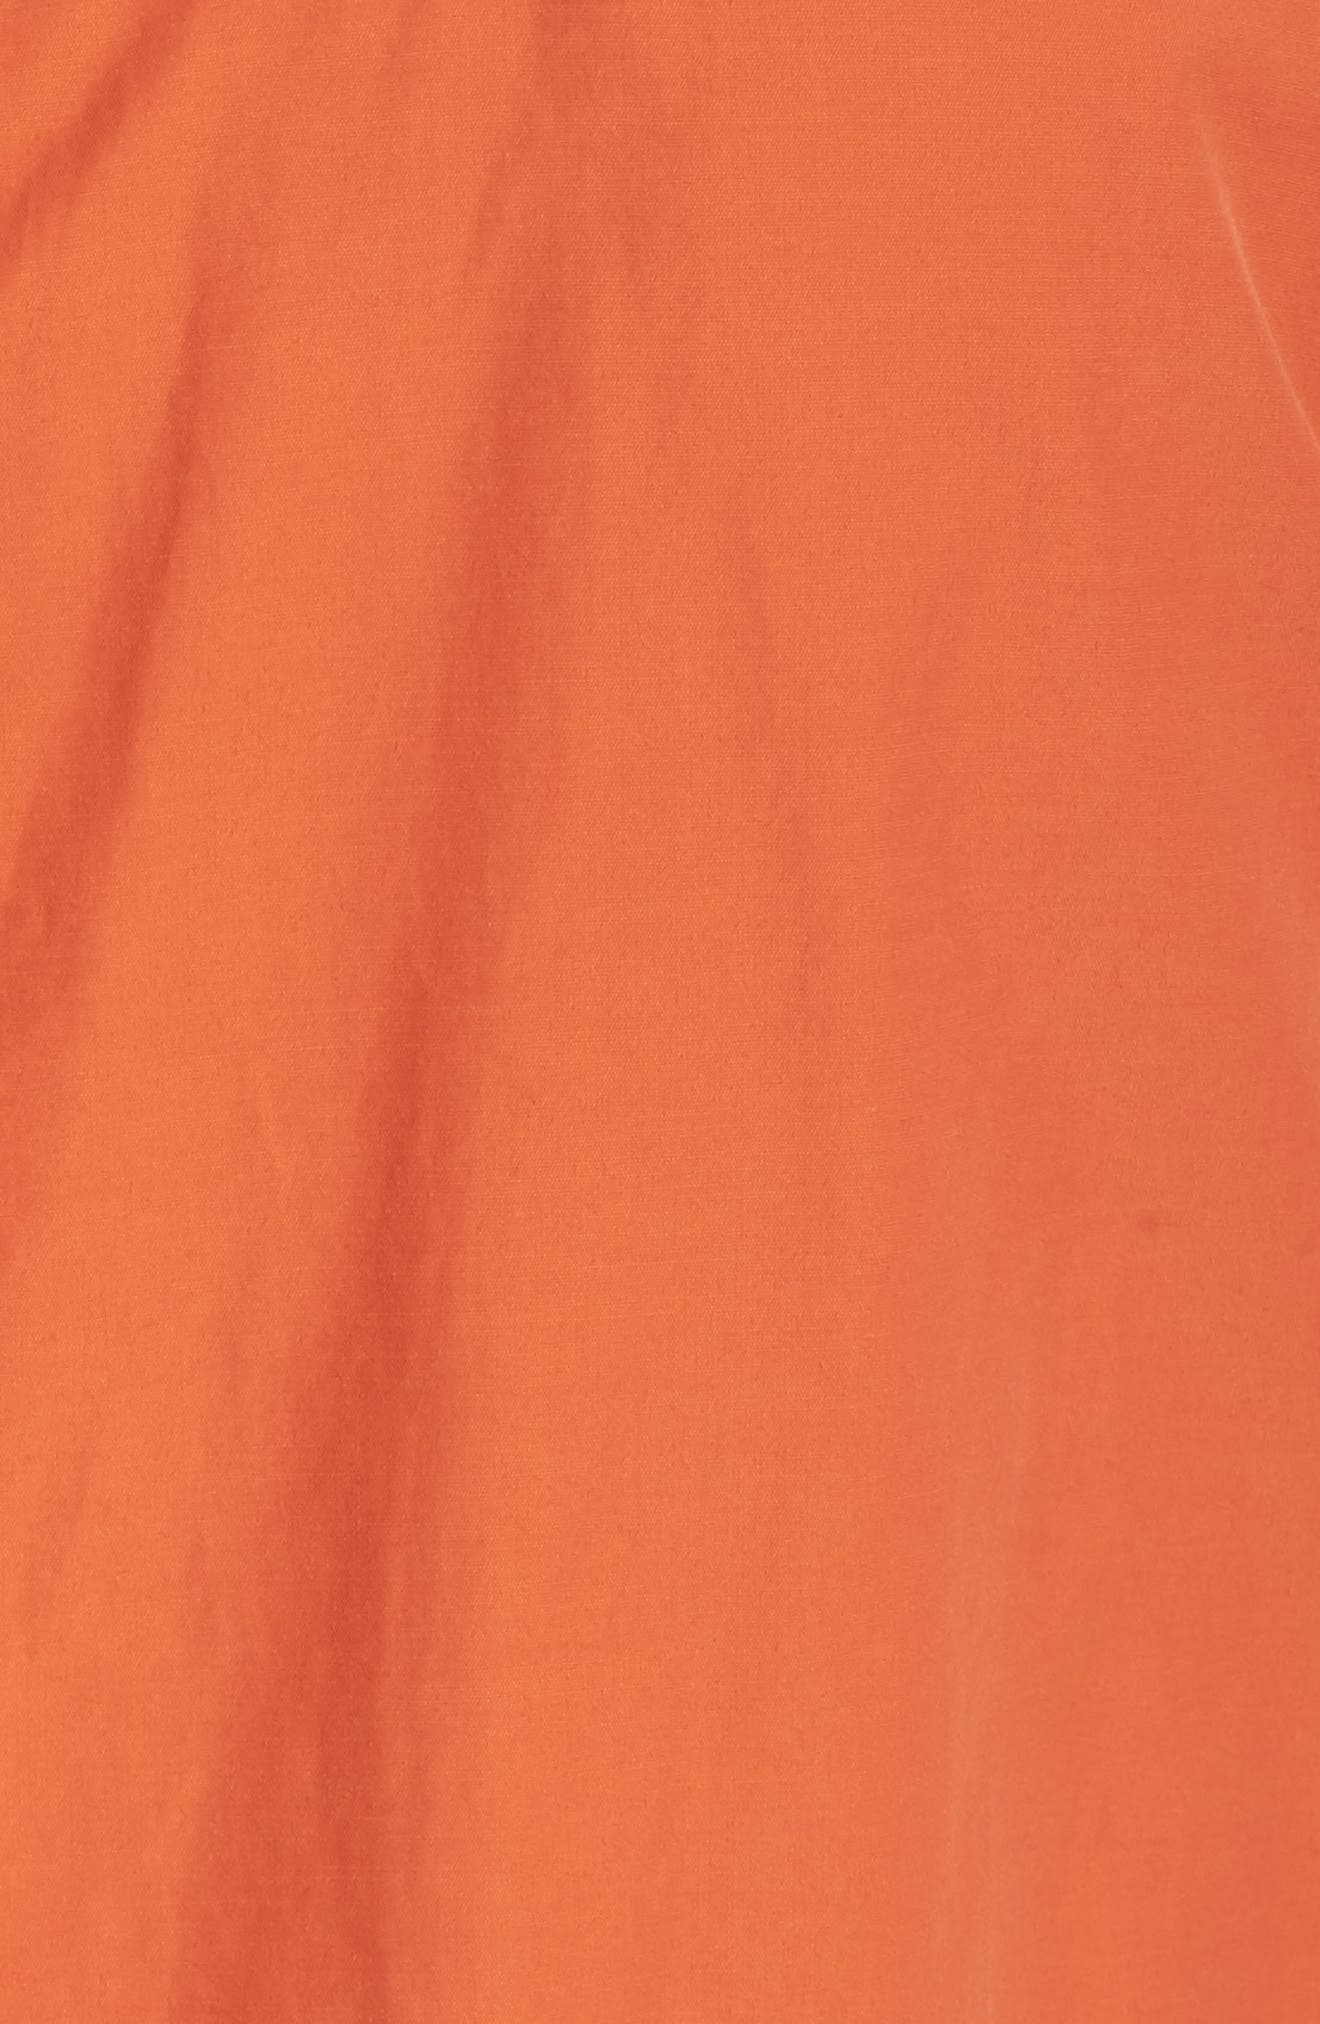 Hooded Organic Cotton Blend Jacket,                             Alternate thumbnail 5, color,                             Tiger